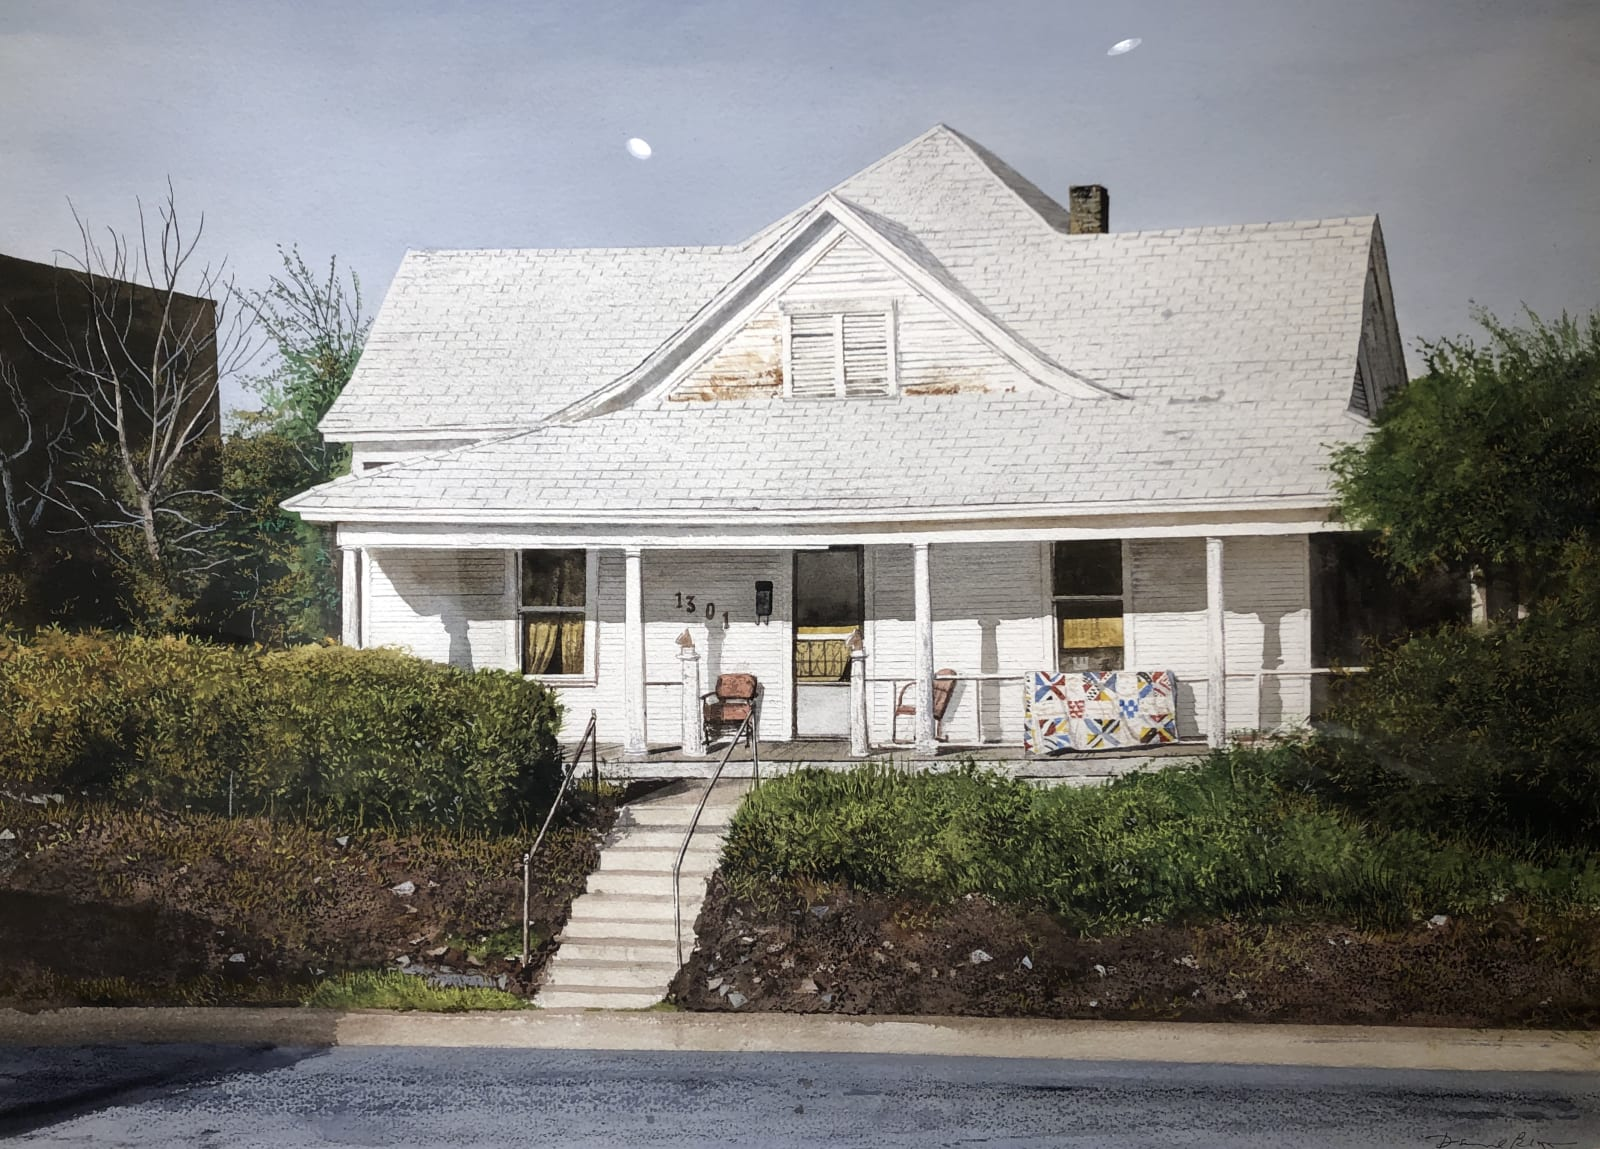 Daniel Blagg, Wright House, 2014